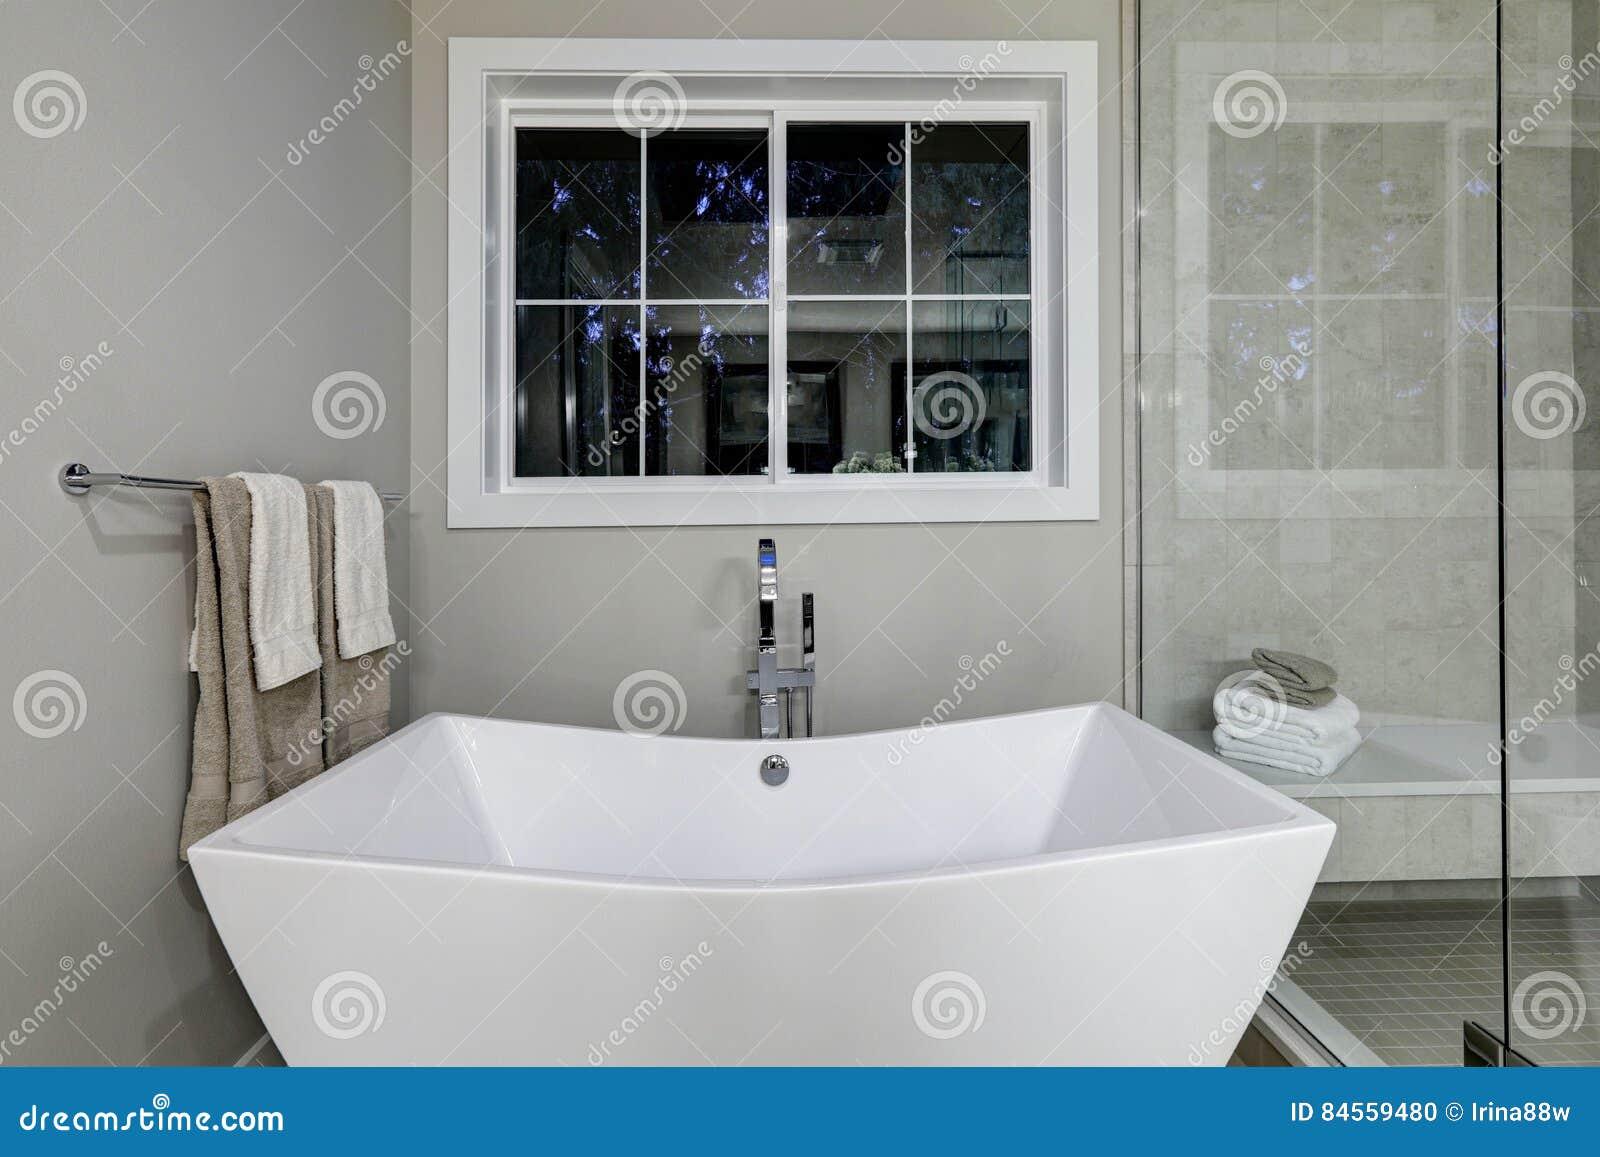 Amazing Master Bathroom With Freestanding Tub Stock Photo - Image of ...